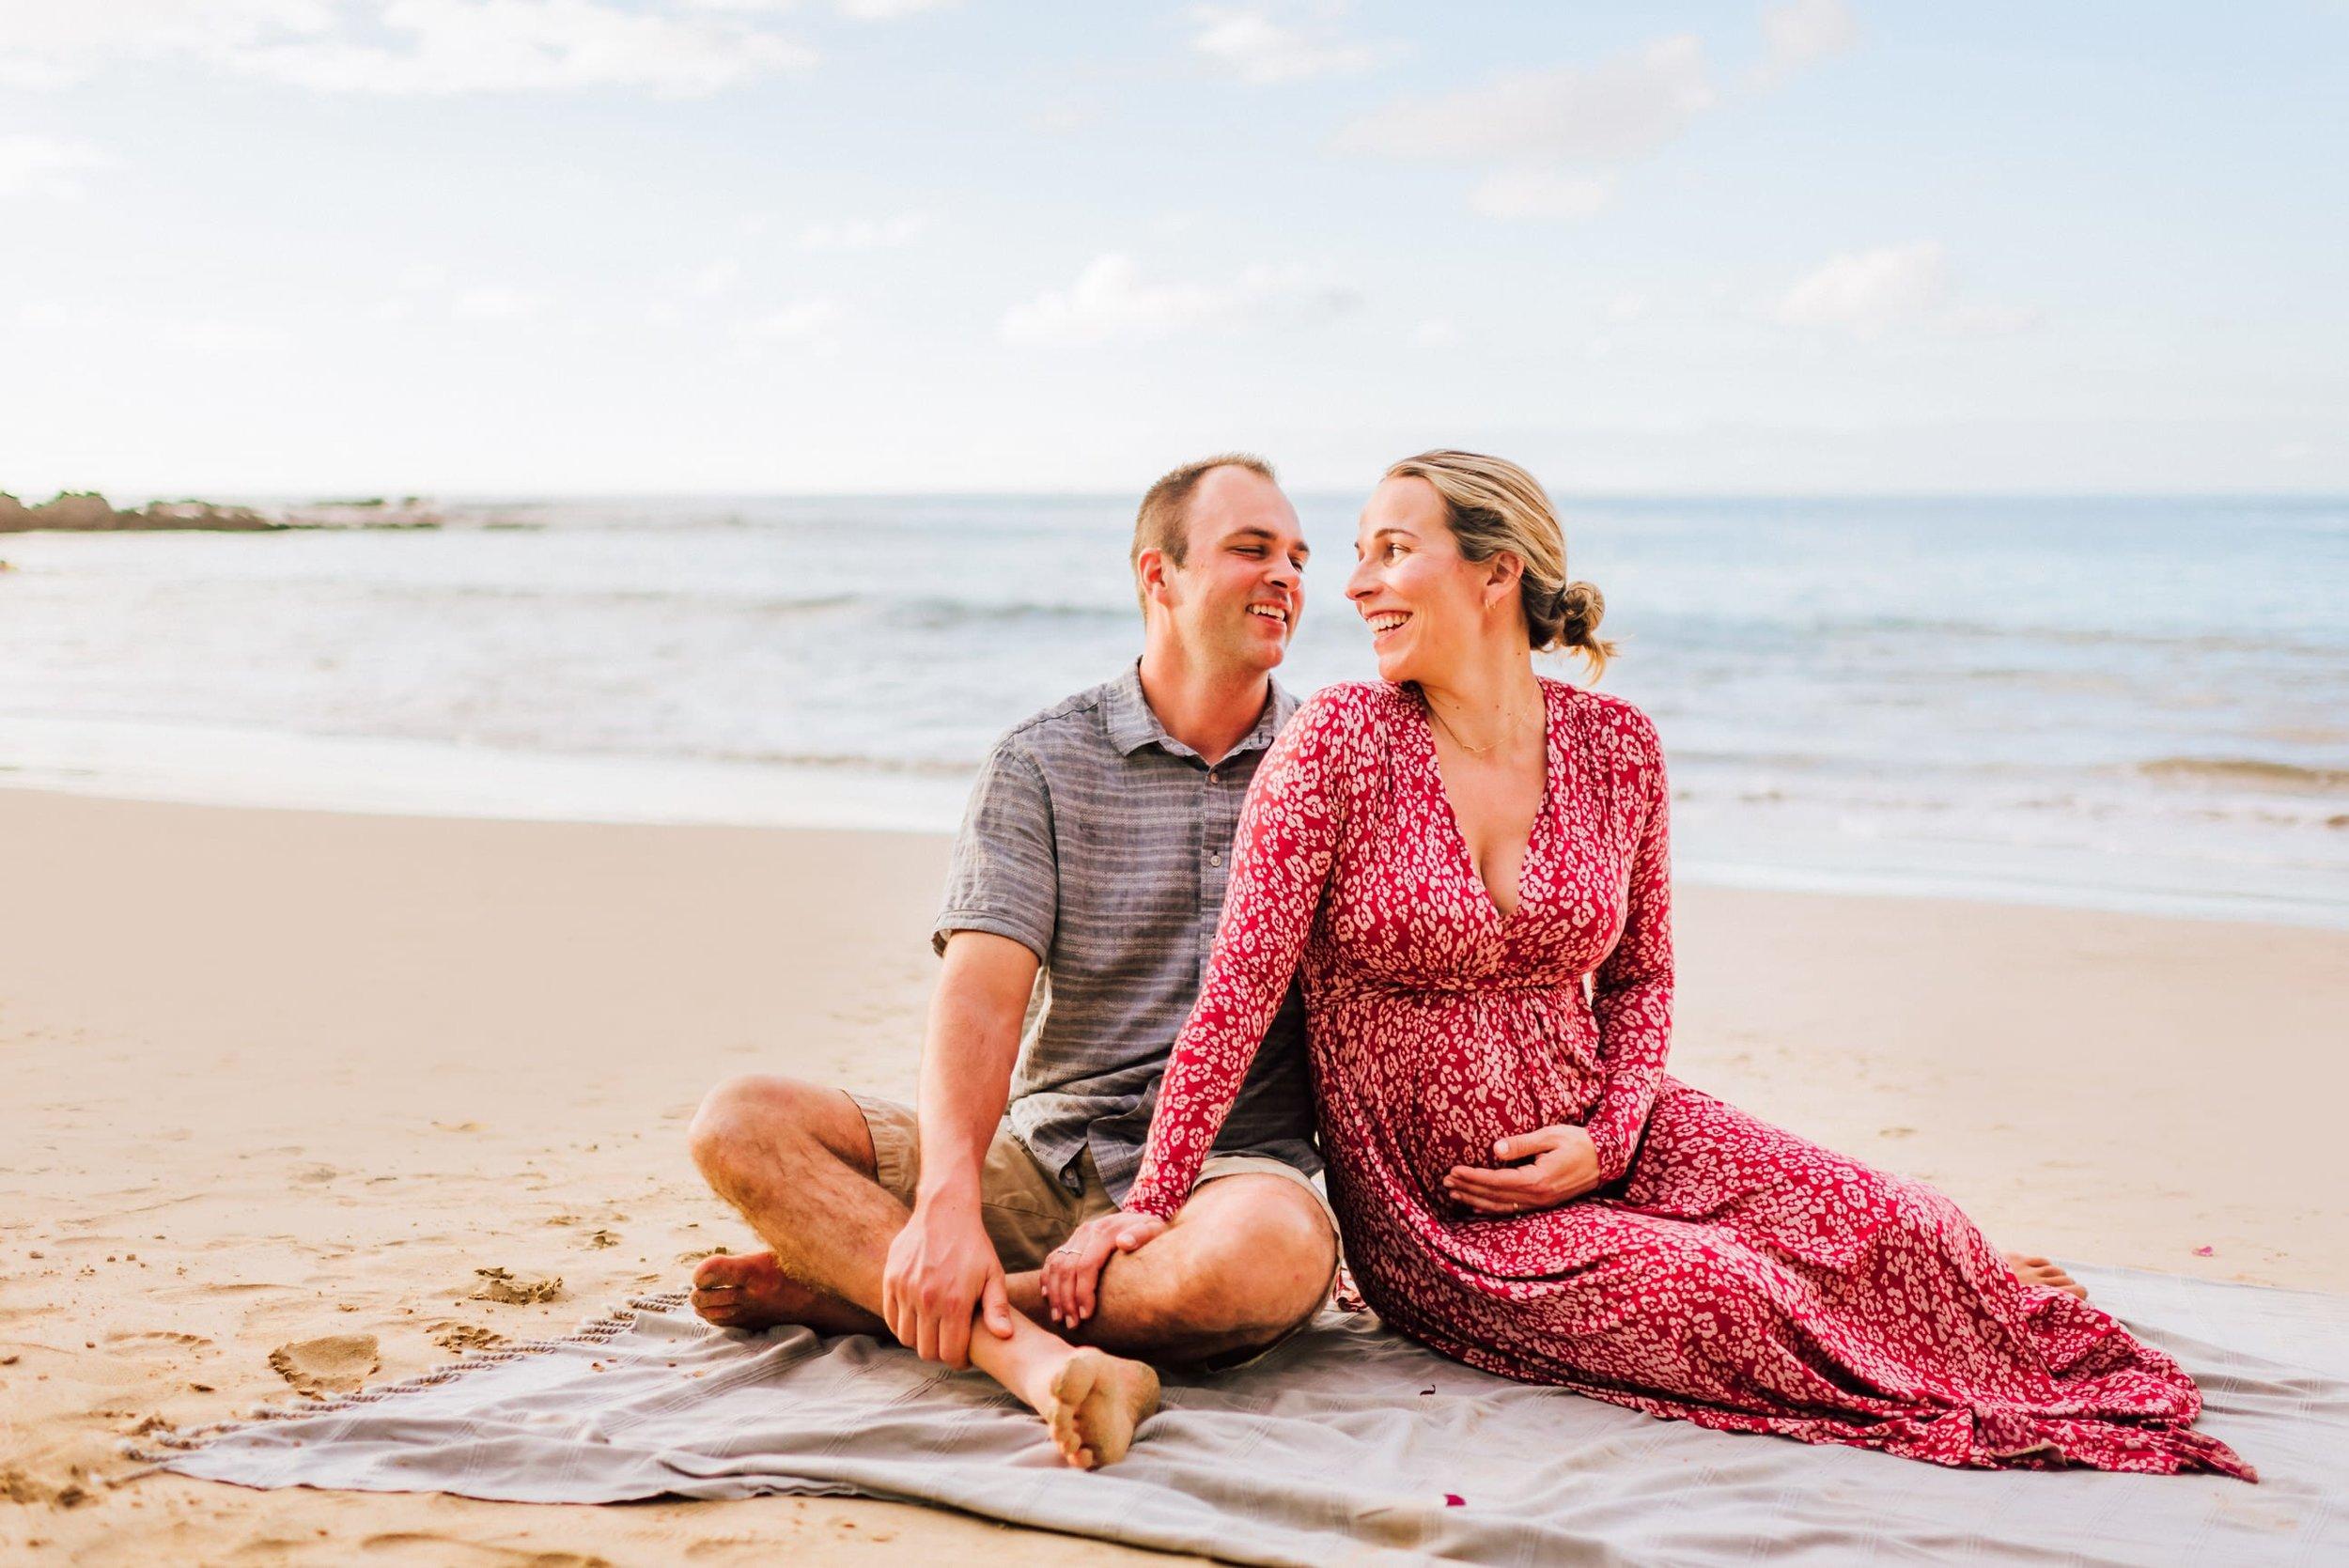 Family-Pictures-Hawaii-Mauna-Kea-Beach-14.jpg